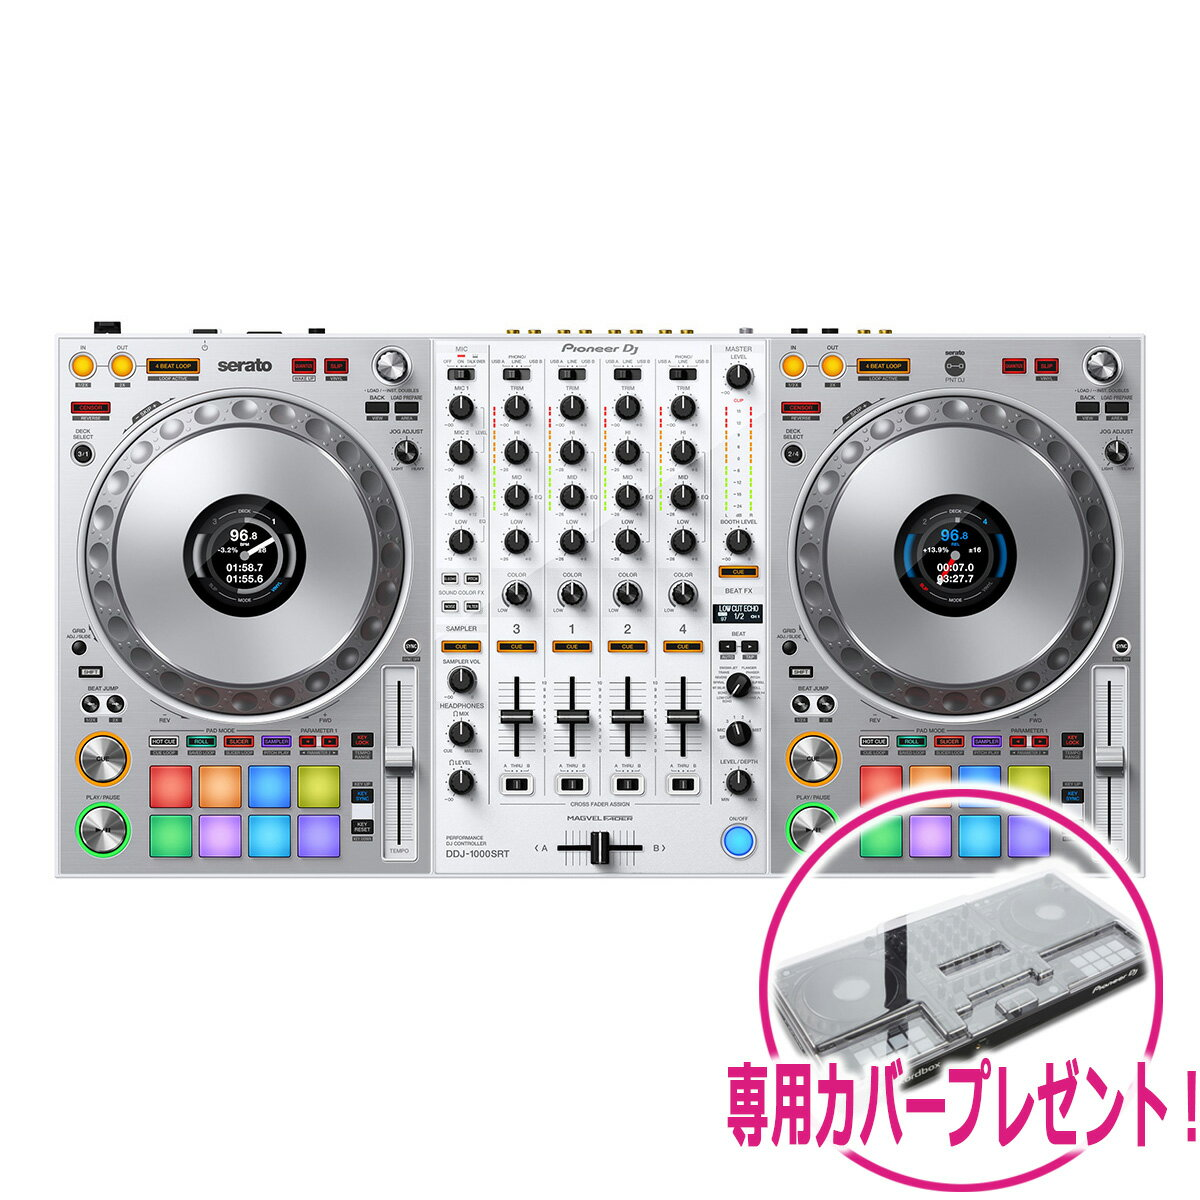 DJ機器, DJコントローラー Serato DJ Suite Pioneer DJ DDJ-1000SRT-W Serato DJ Pro 4chDJ